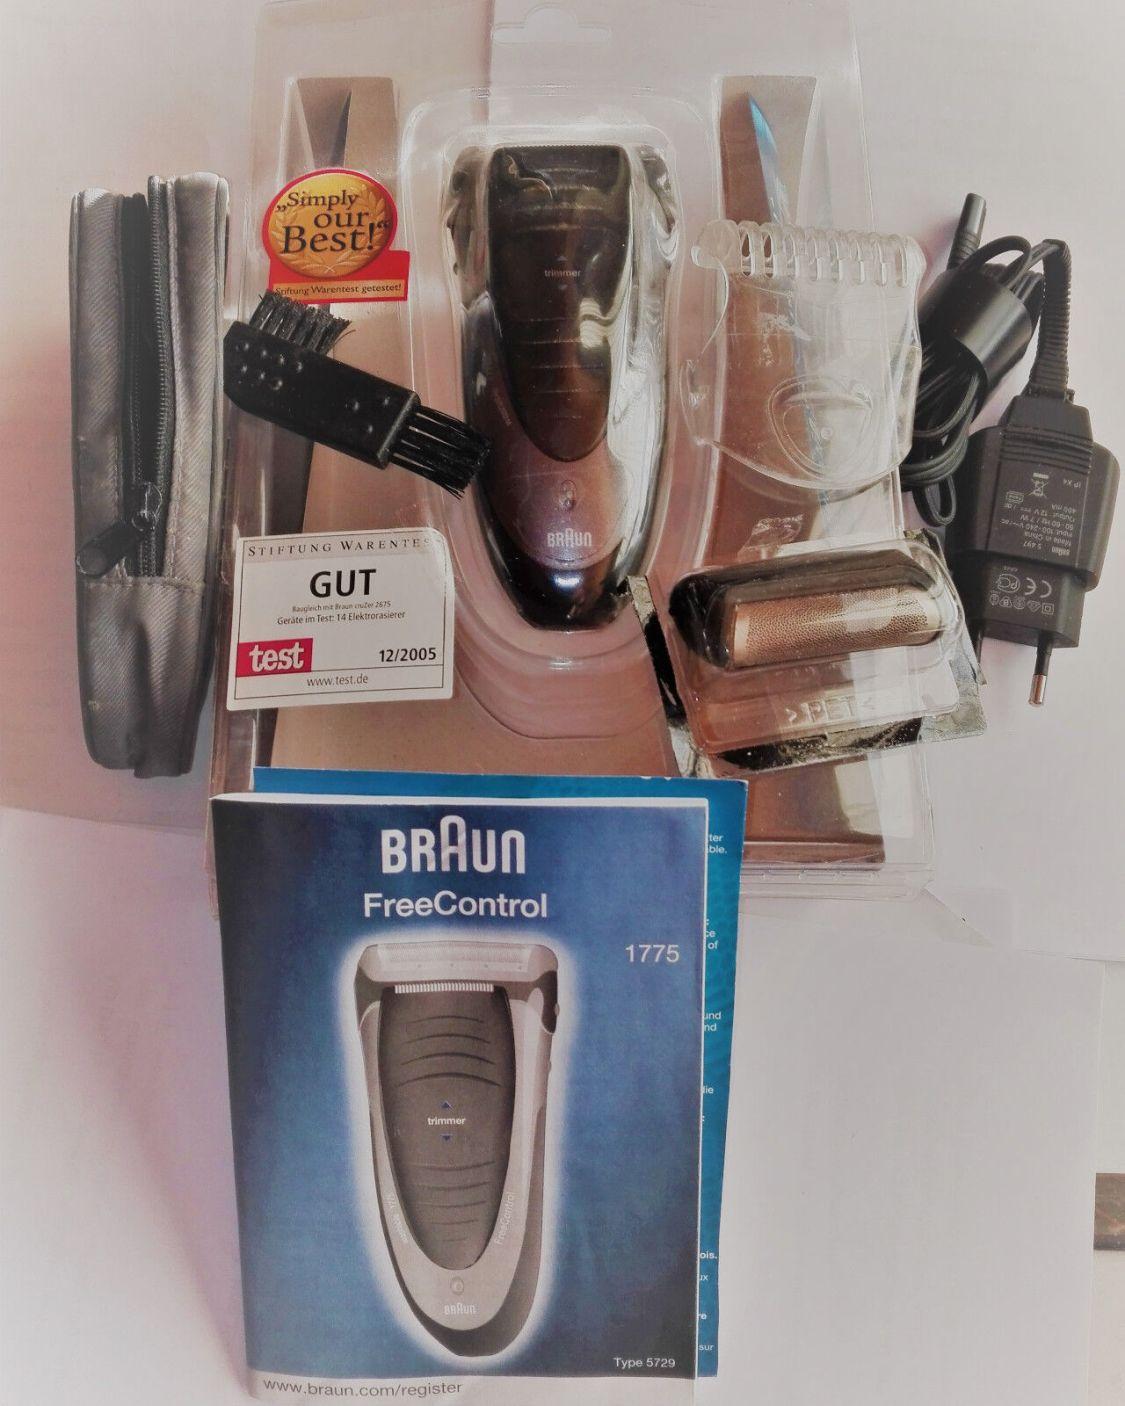 Braun FreeControl Folienrasierer Rasierer 1775 - Series 1000  - Silber/Schwarz